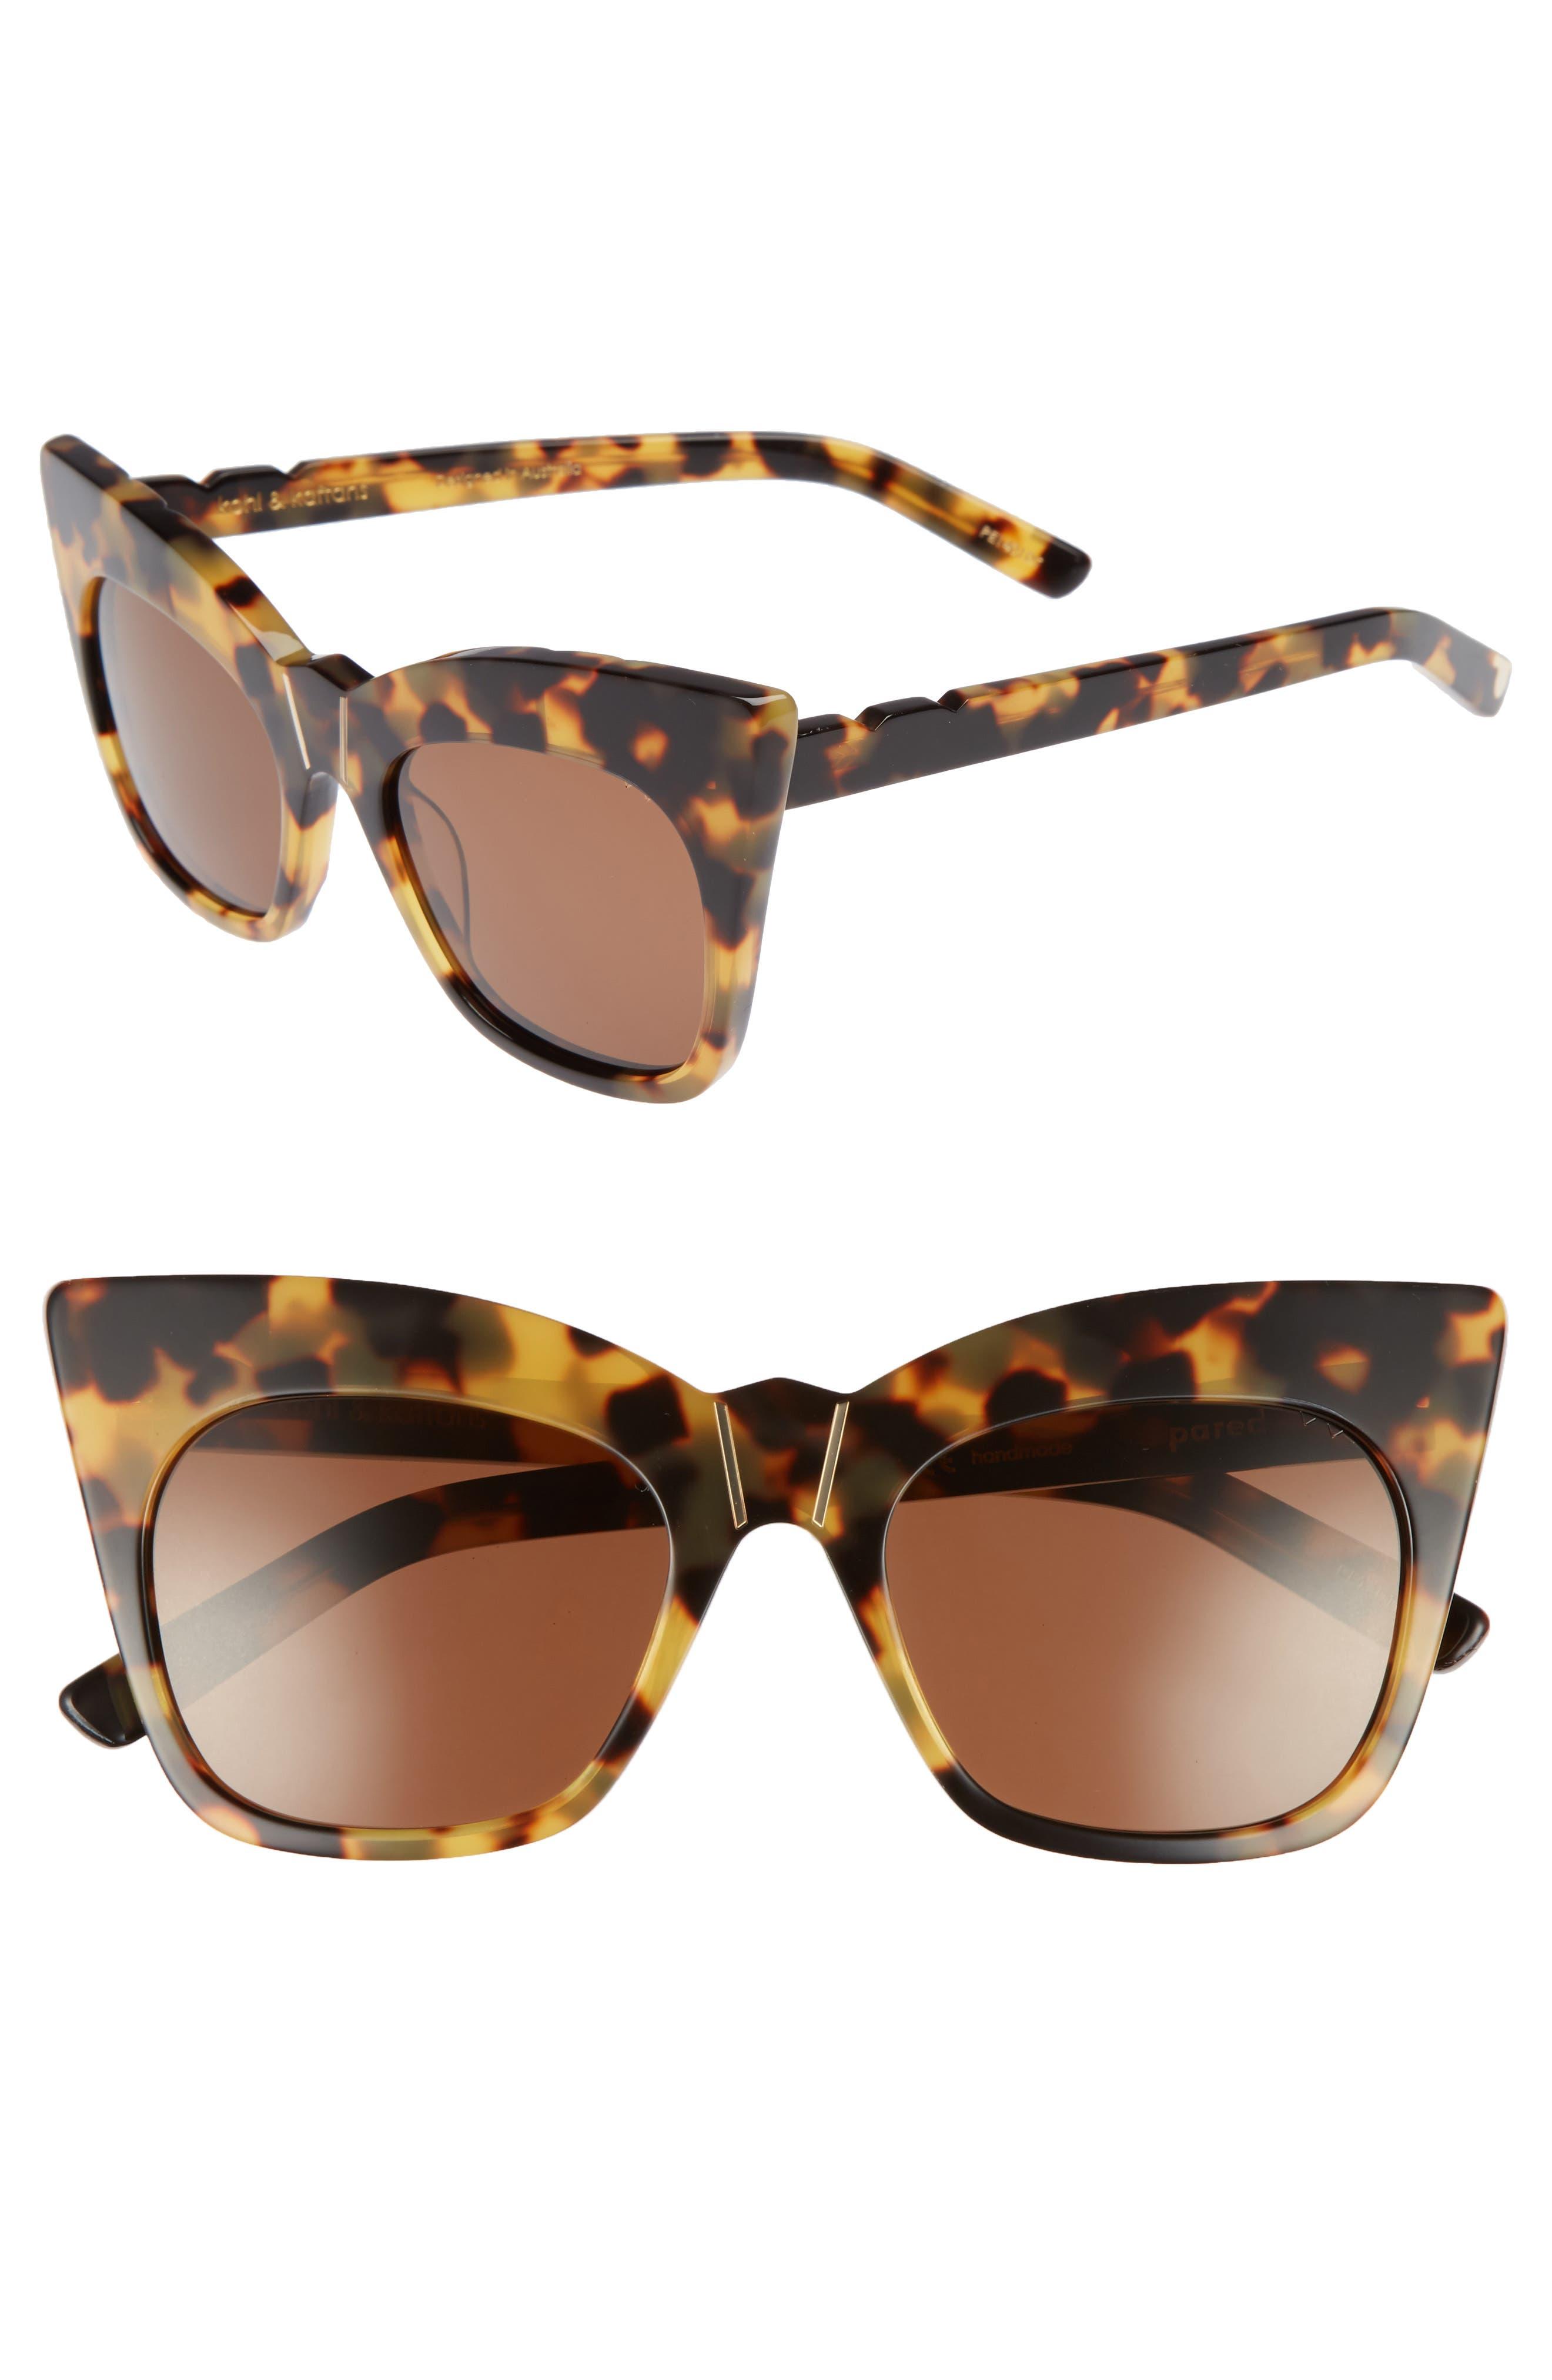 Kohl & Kaftans 52mm Cat Eye Sunglasses,                         Main,                         color, 203